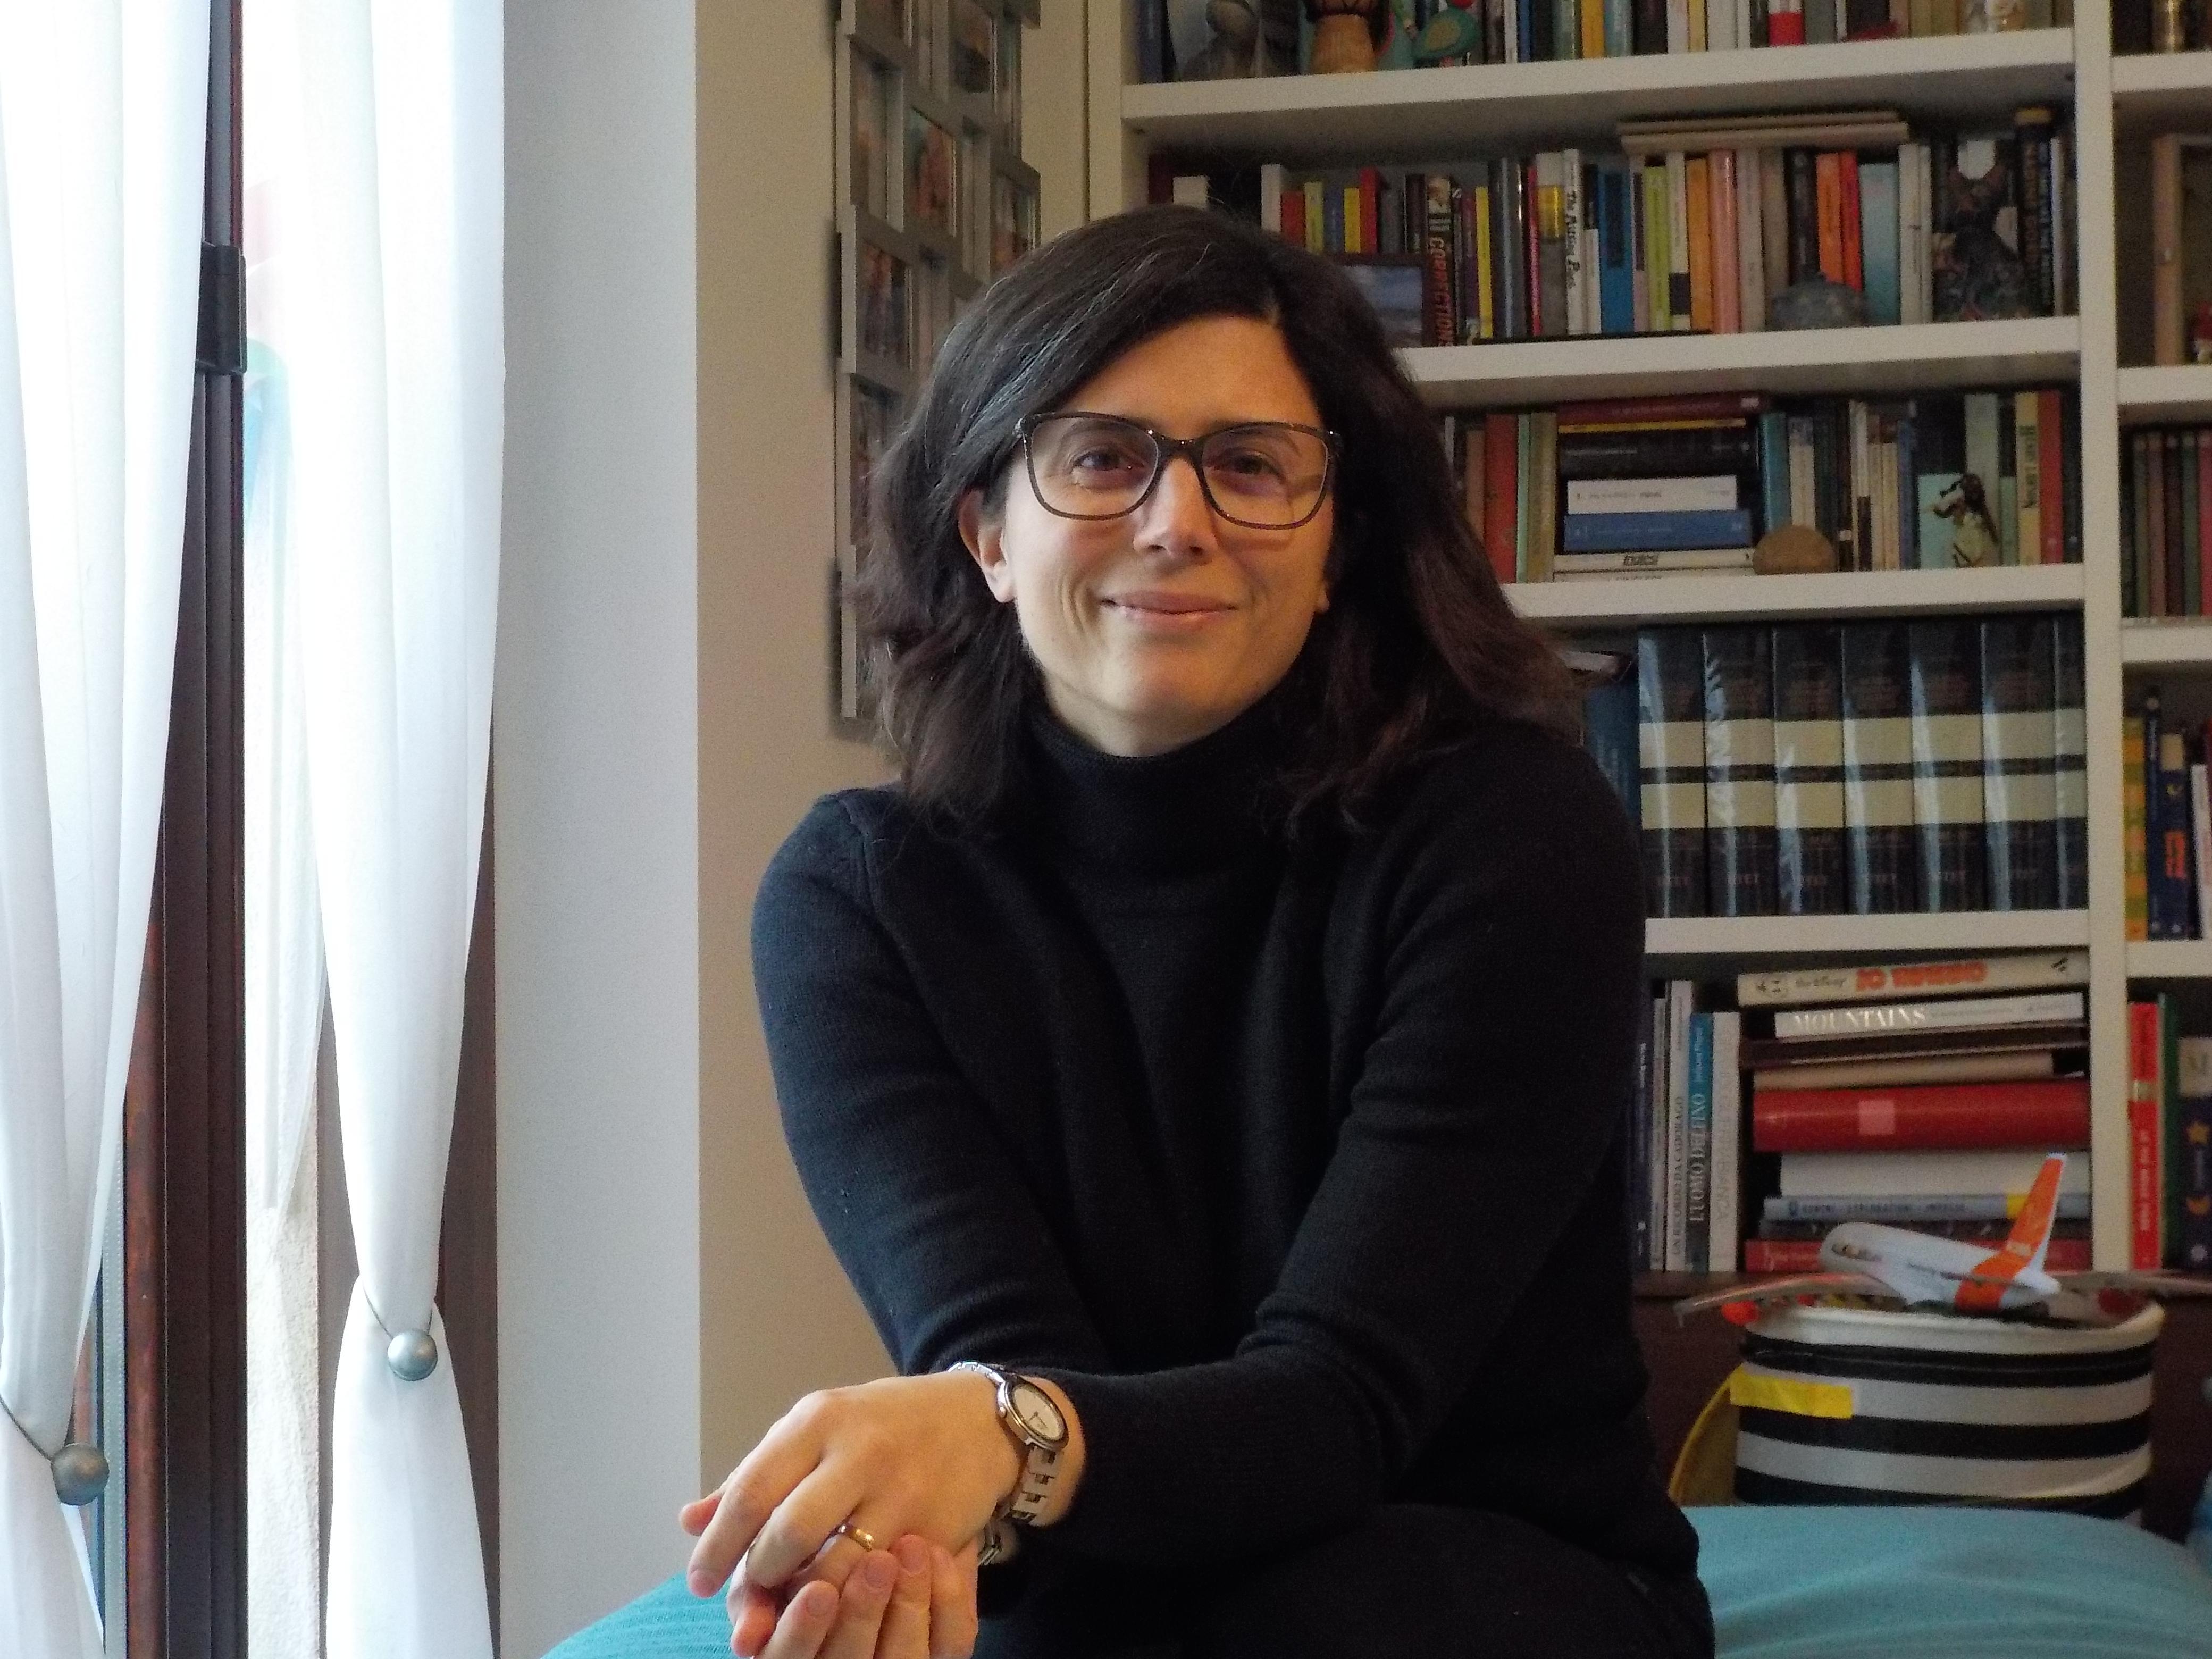 Silvia Fornasiero